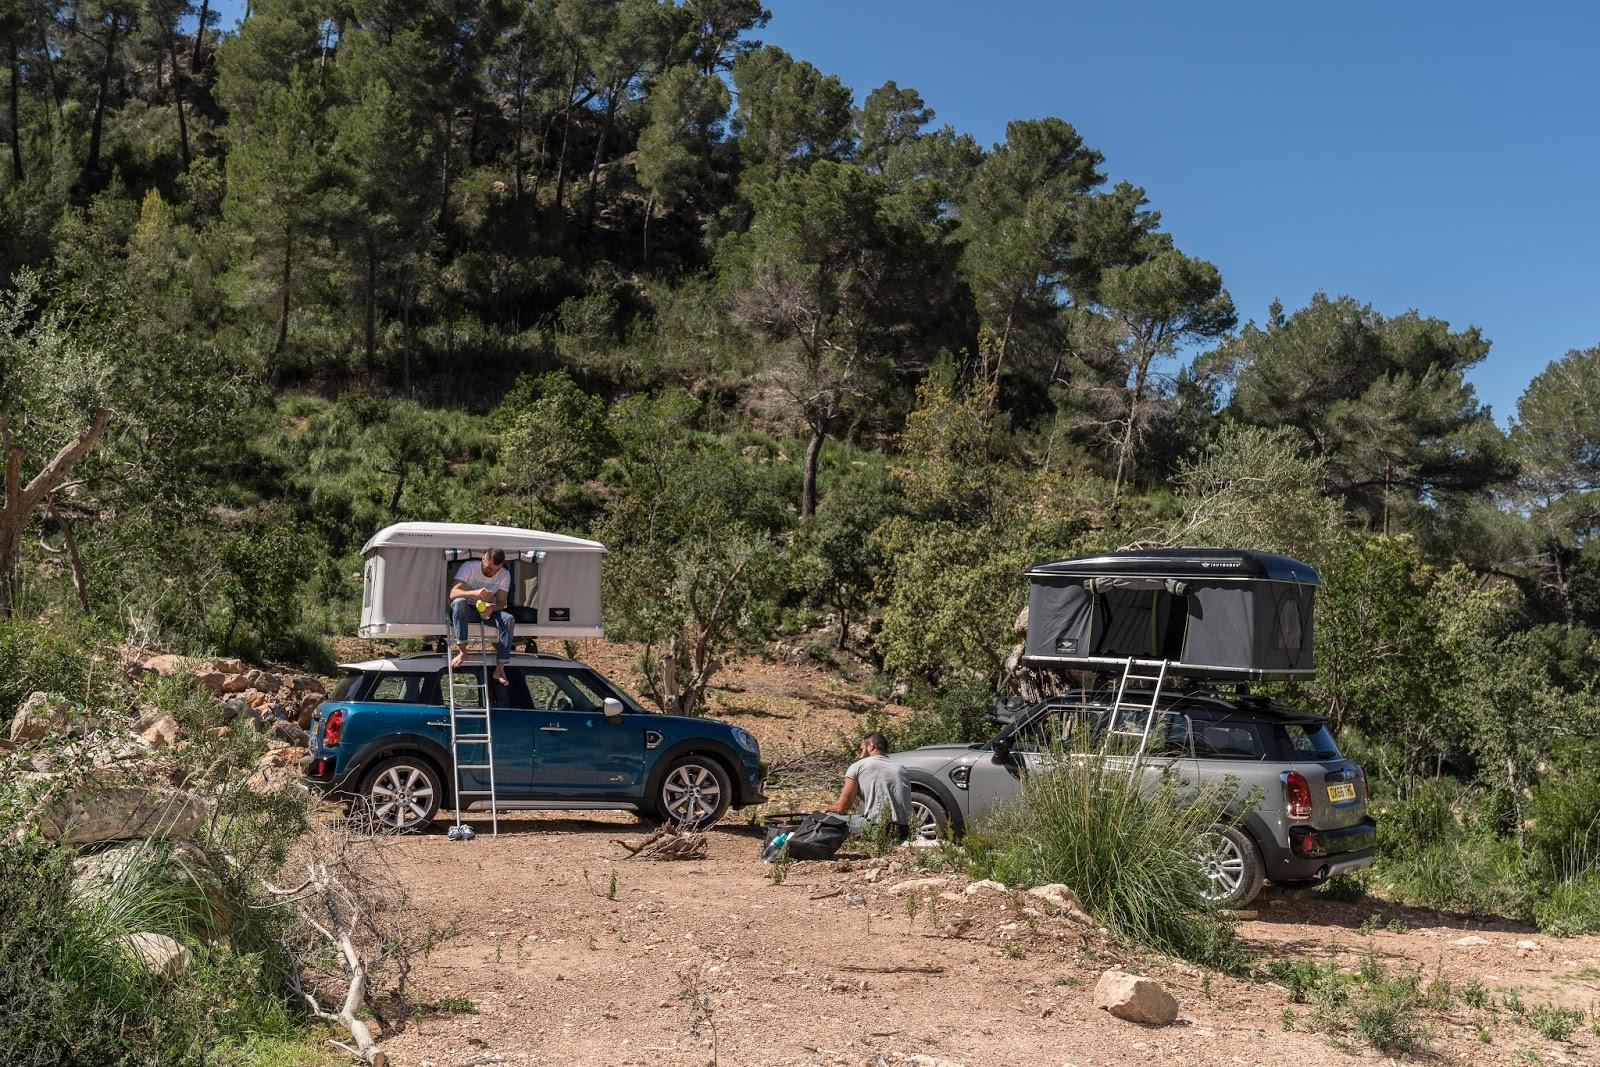 P90258014 highRes the autohome roof te Το MINI Countryman έχει και... σκηνή οροφής Mini, MINI Cooper Countryman, SUV